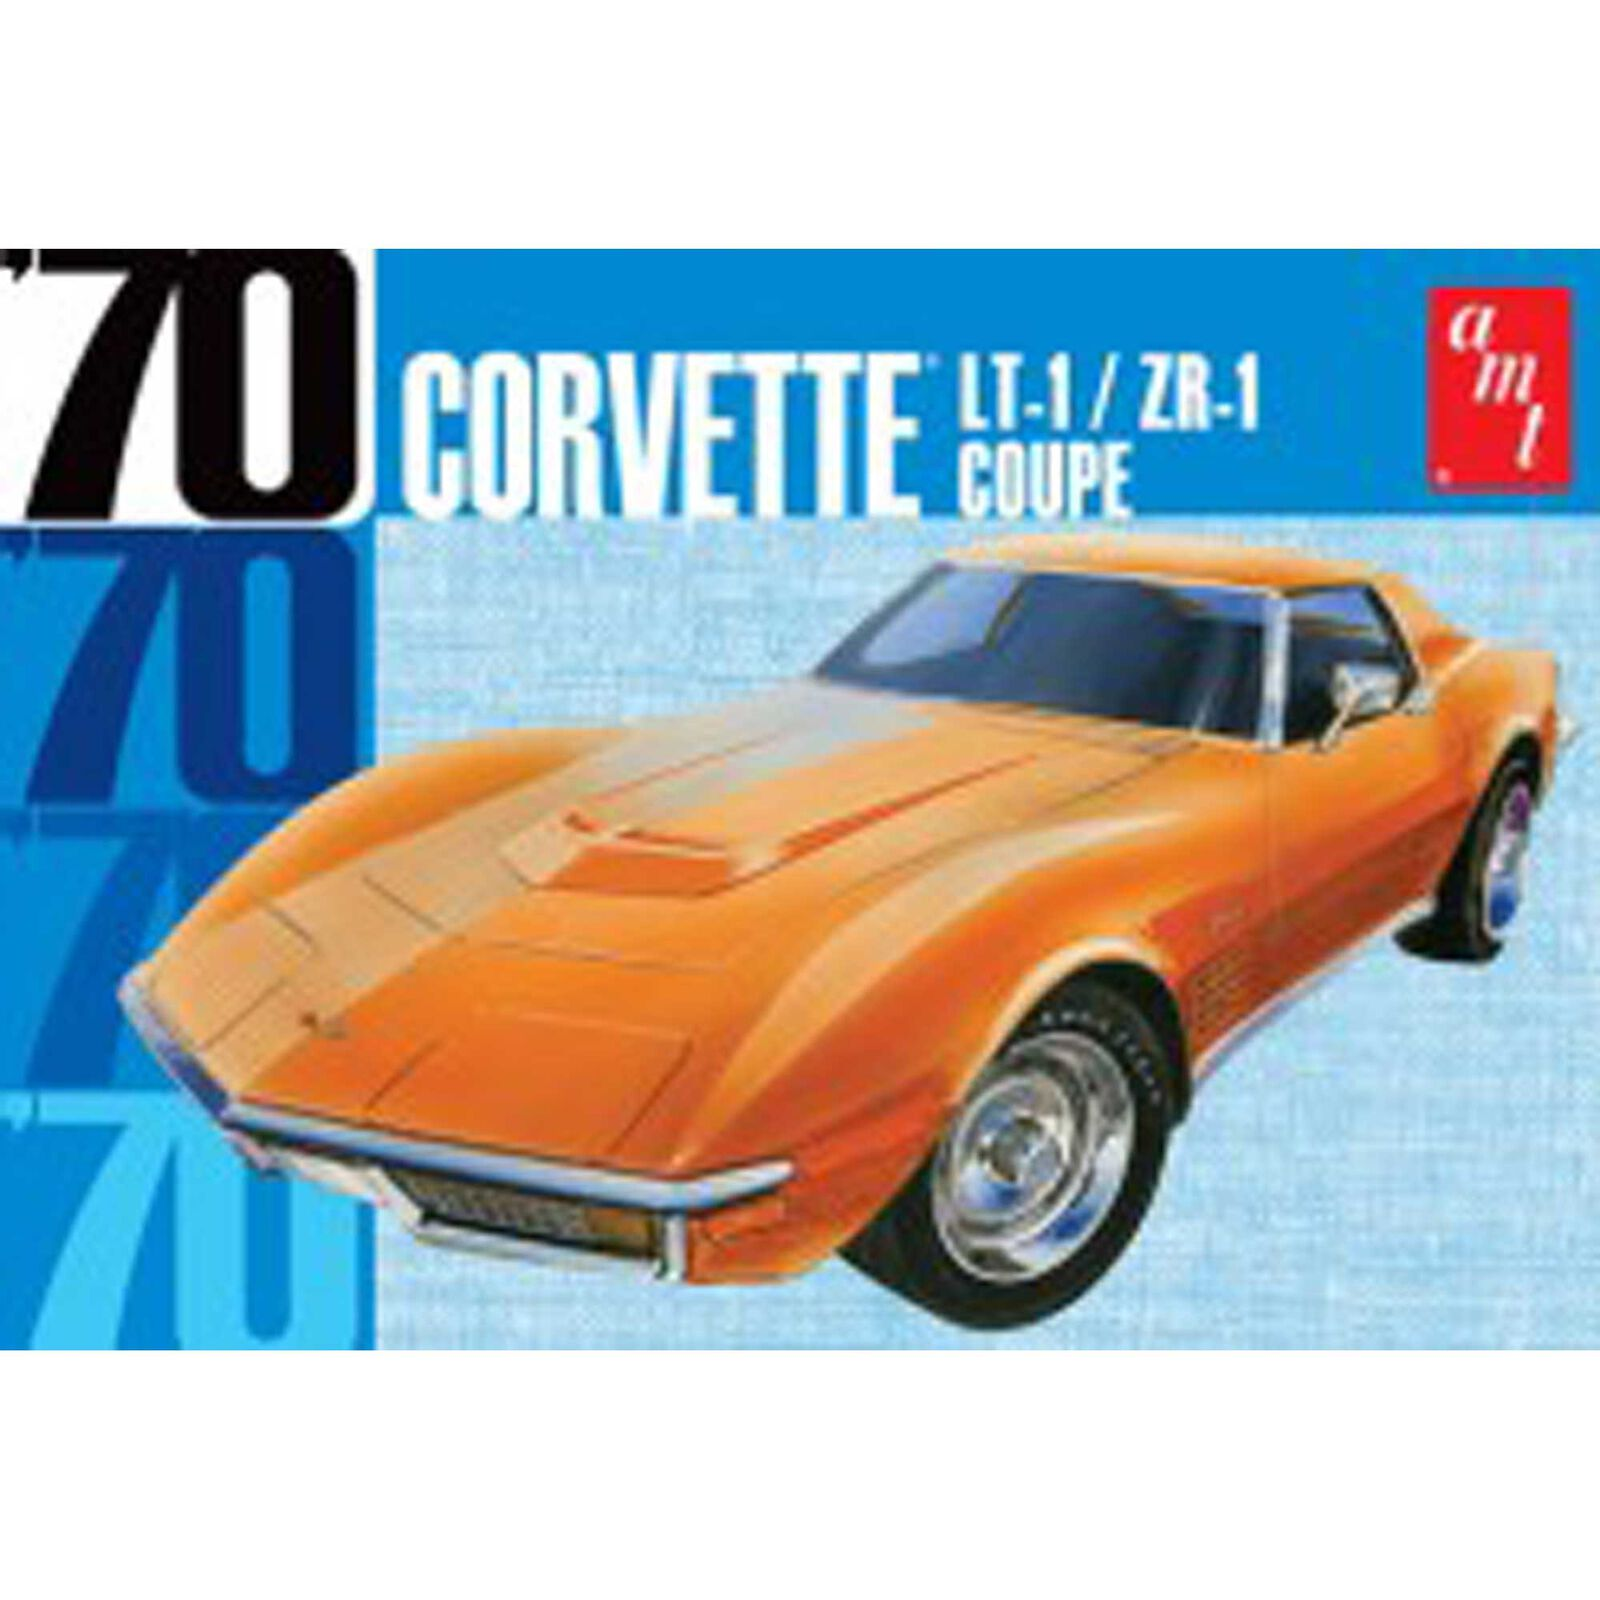 1/25 1970 Chevy Corvette Coupe, Model Kit